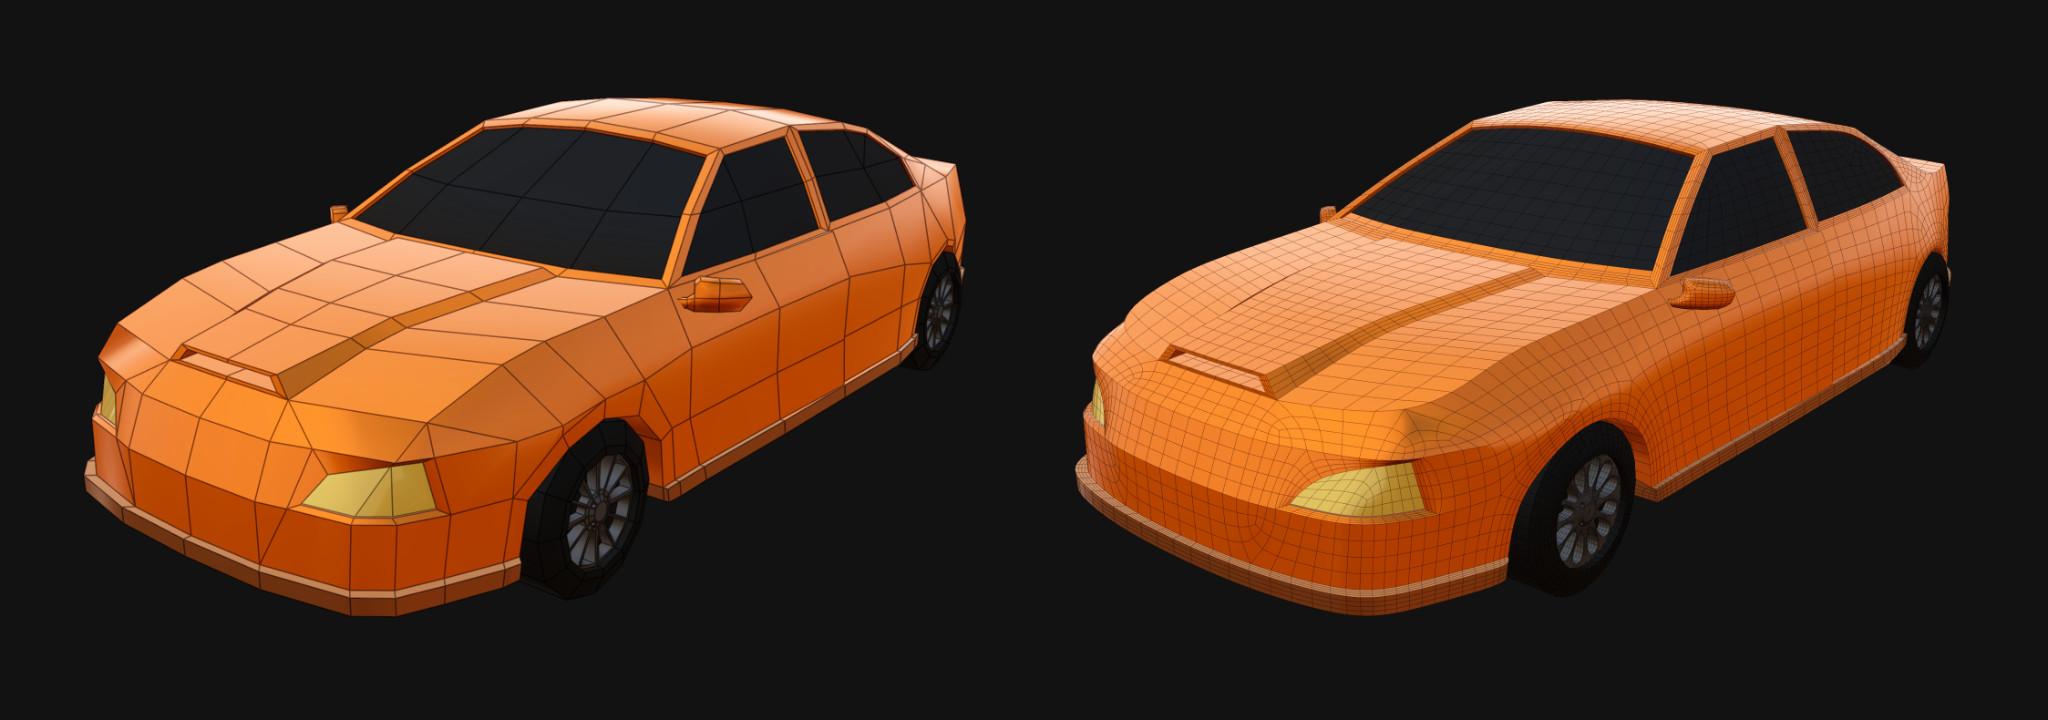 Low poly car model